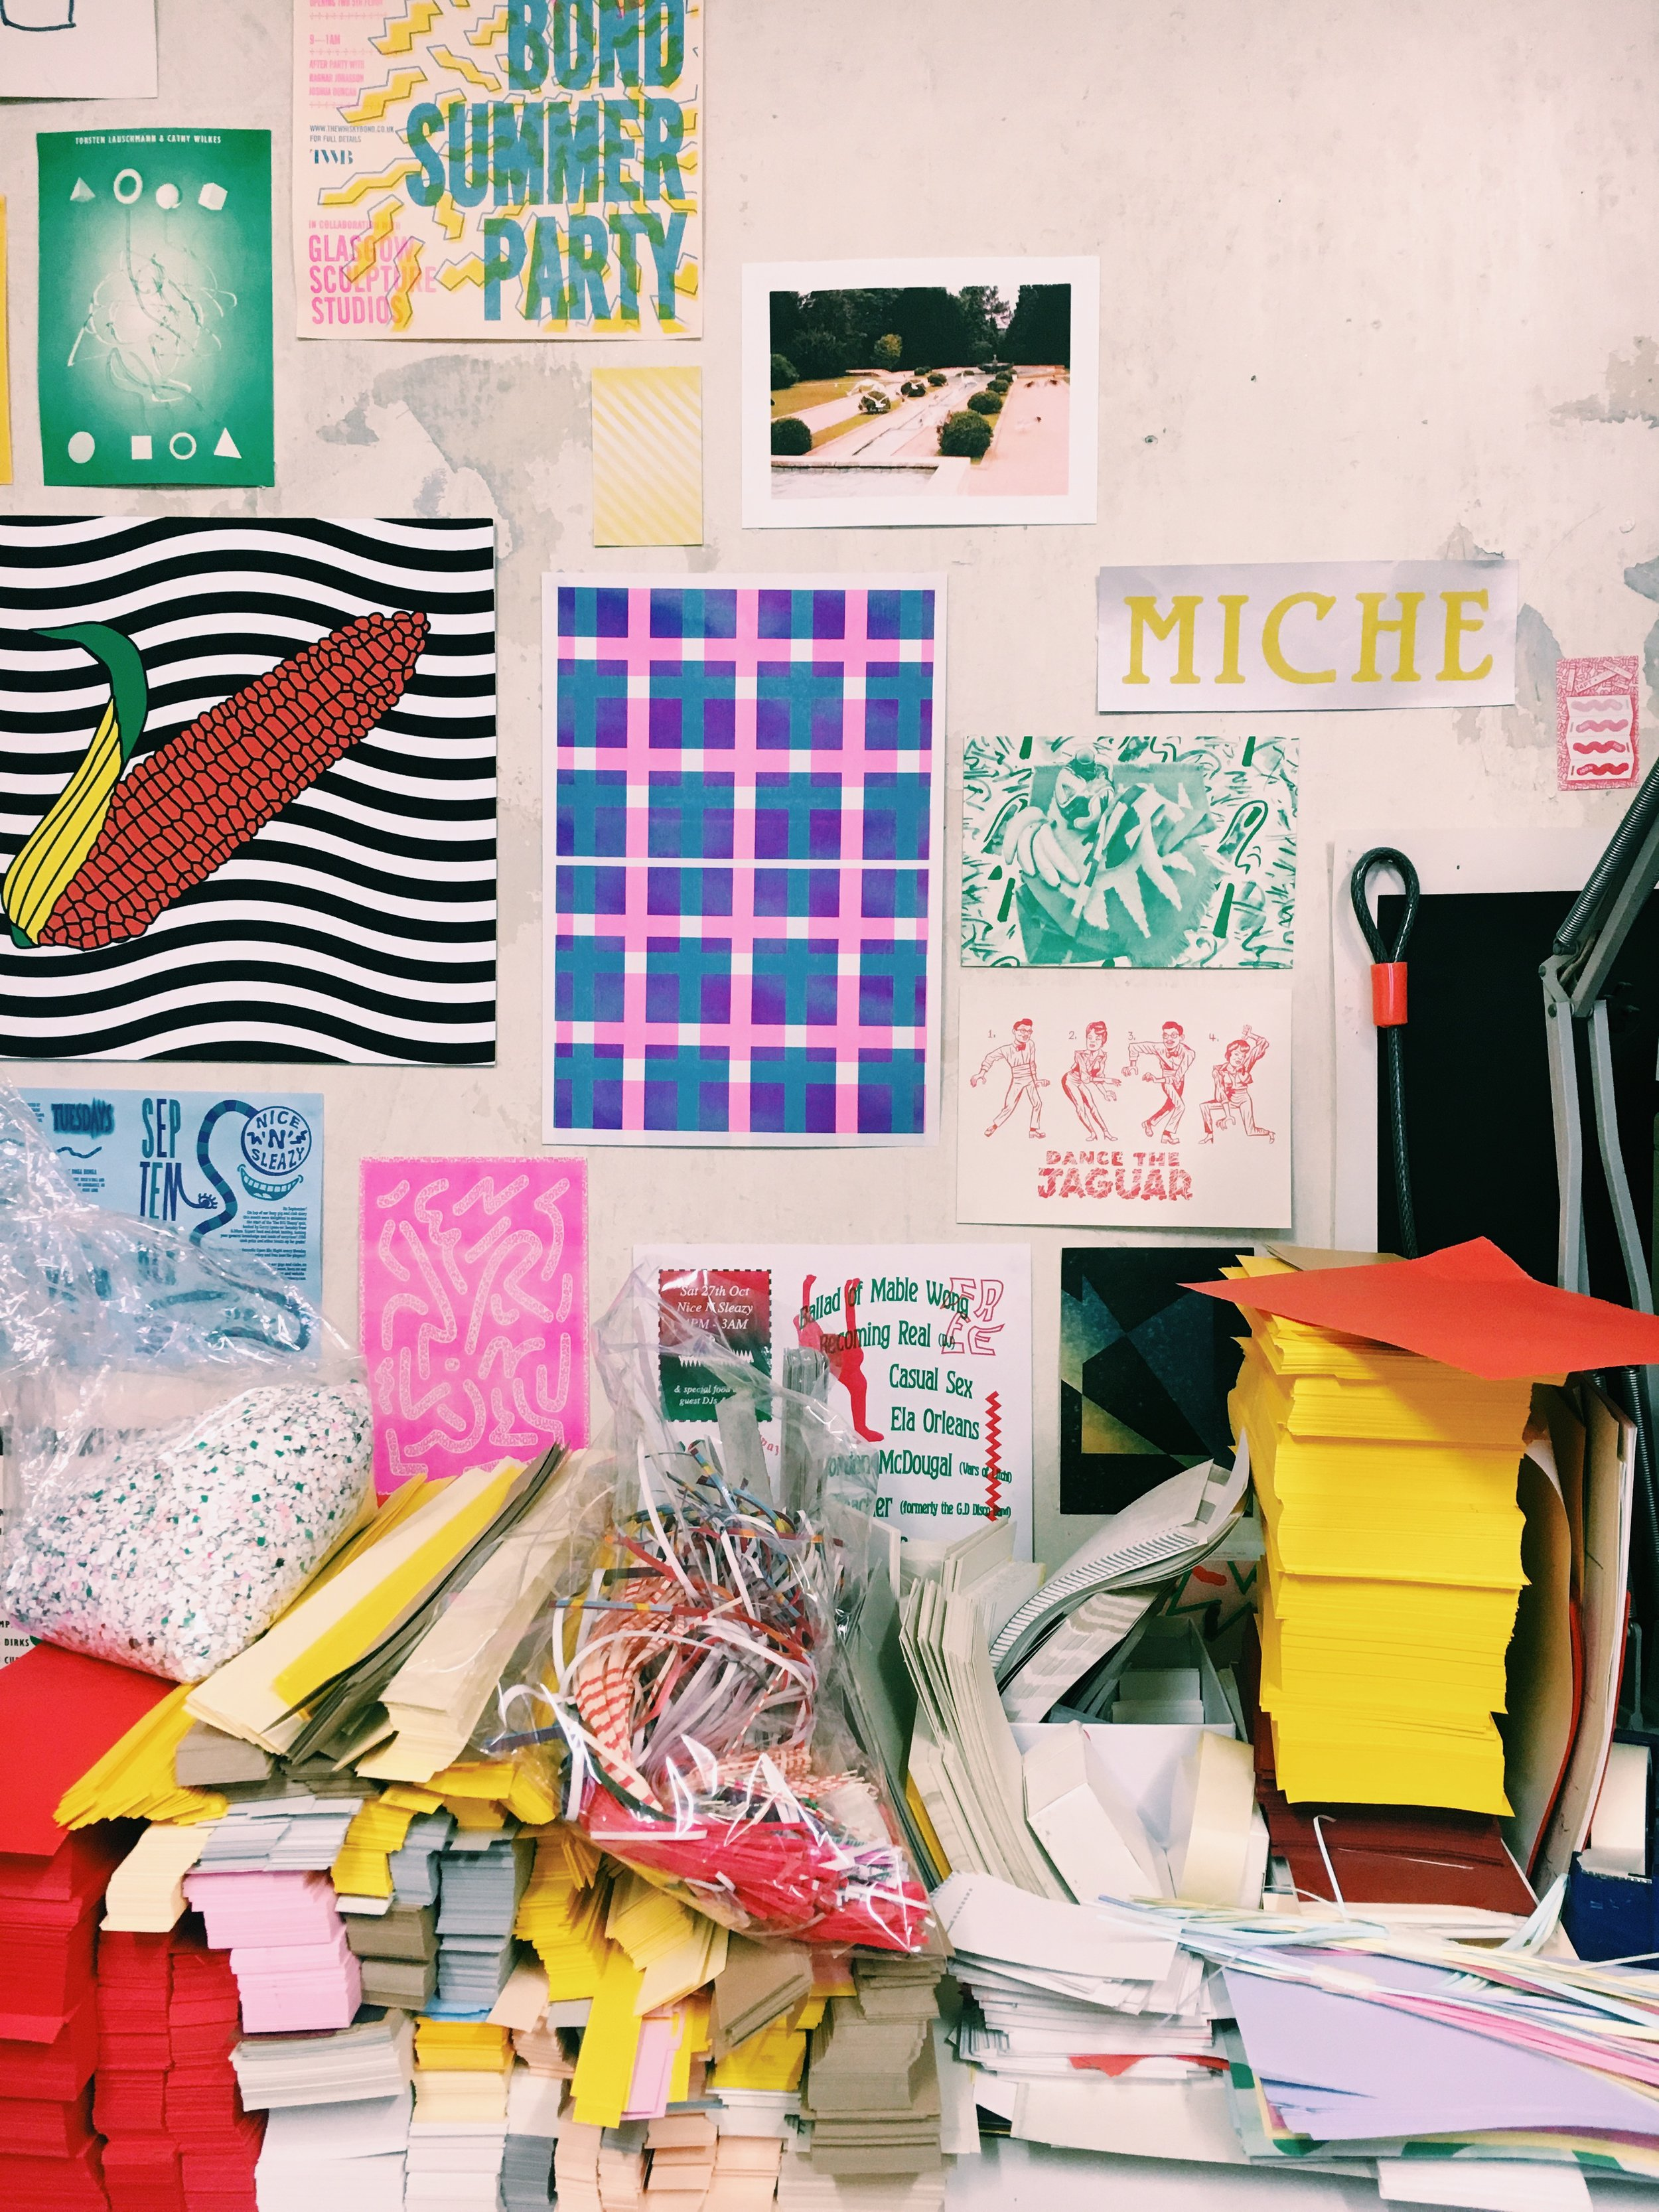 Studio Visit: Risotto Studios, Glasgow on the Print Club Ltd. Journal